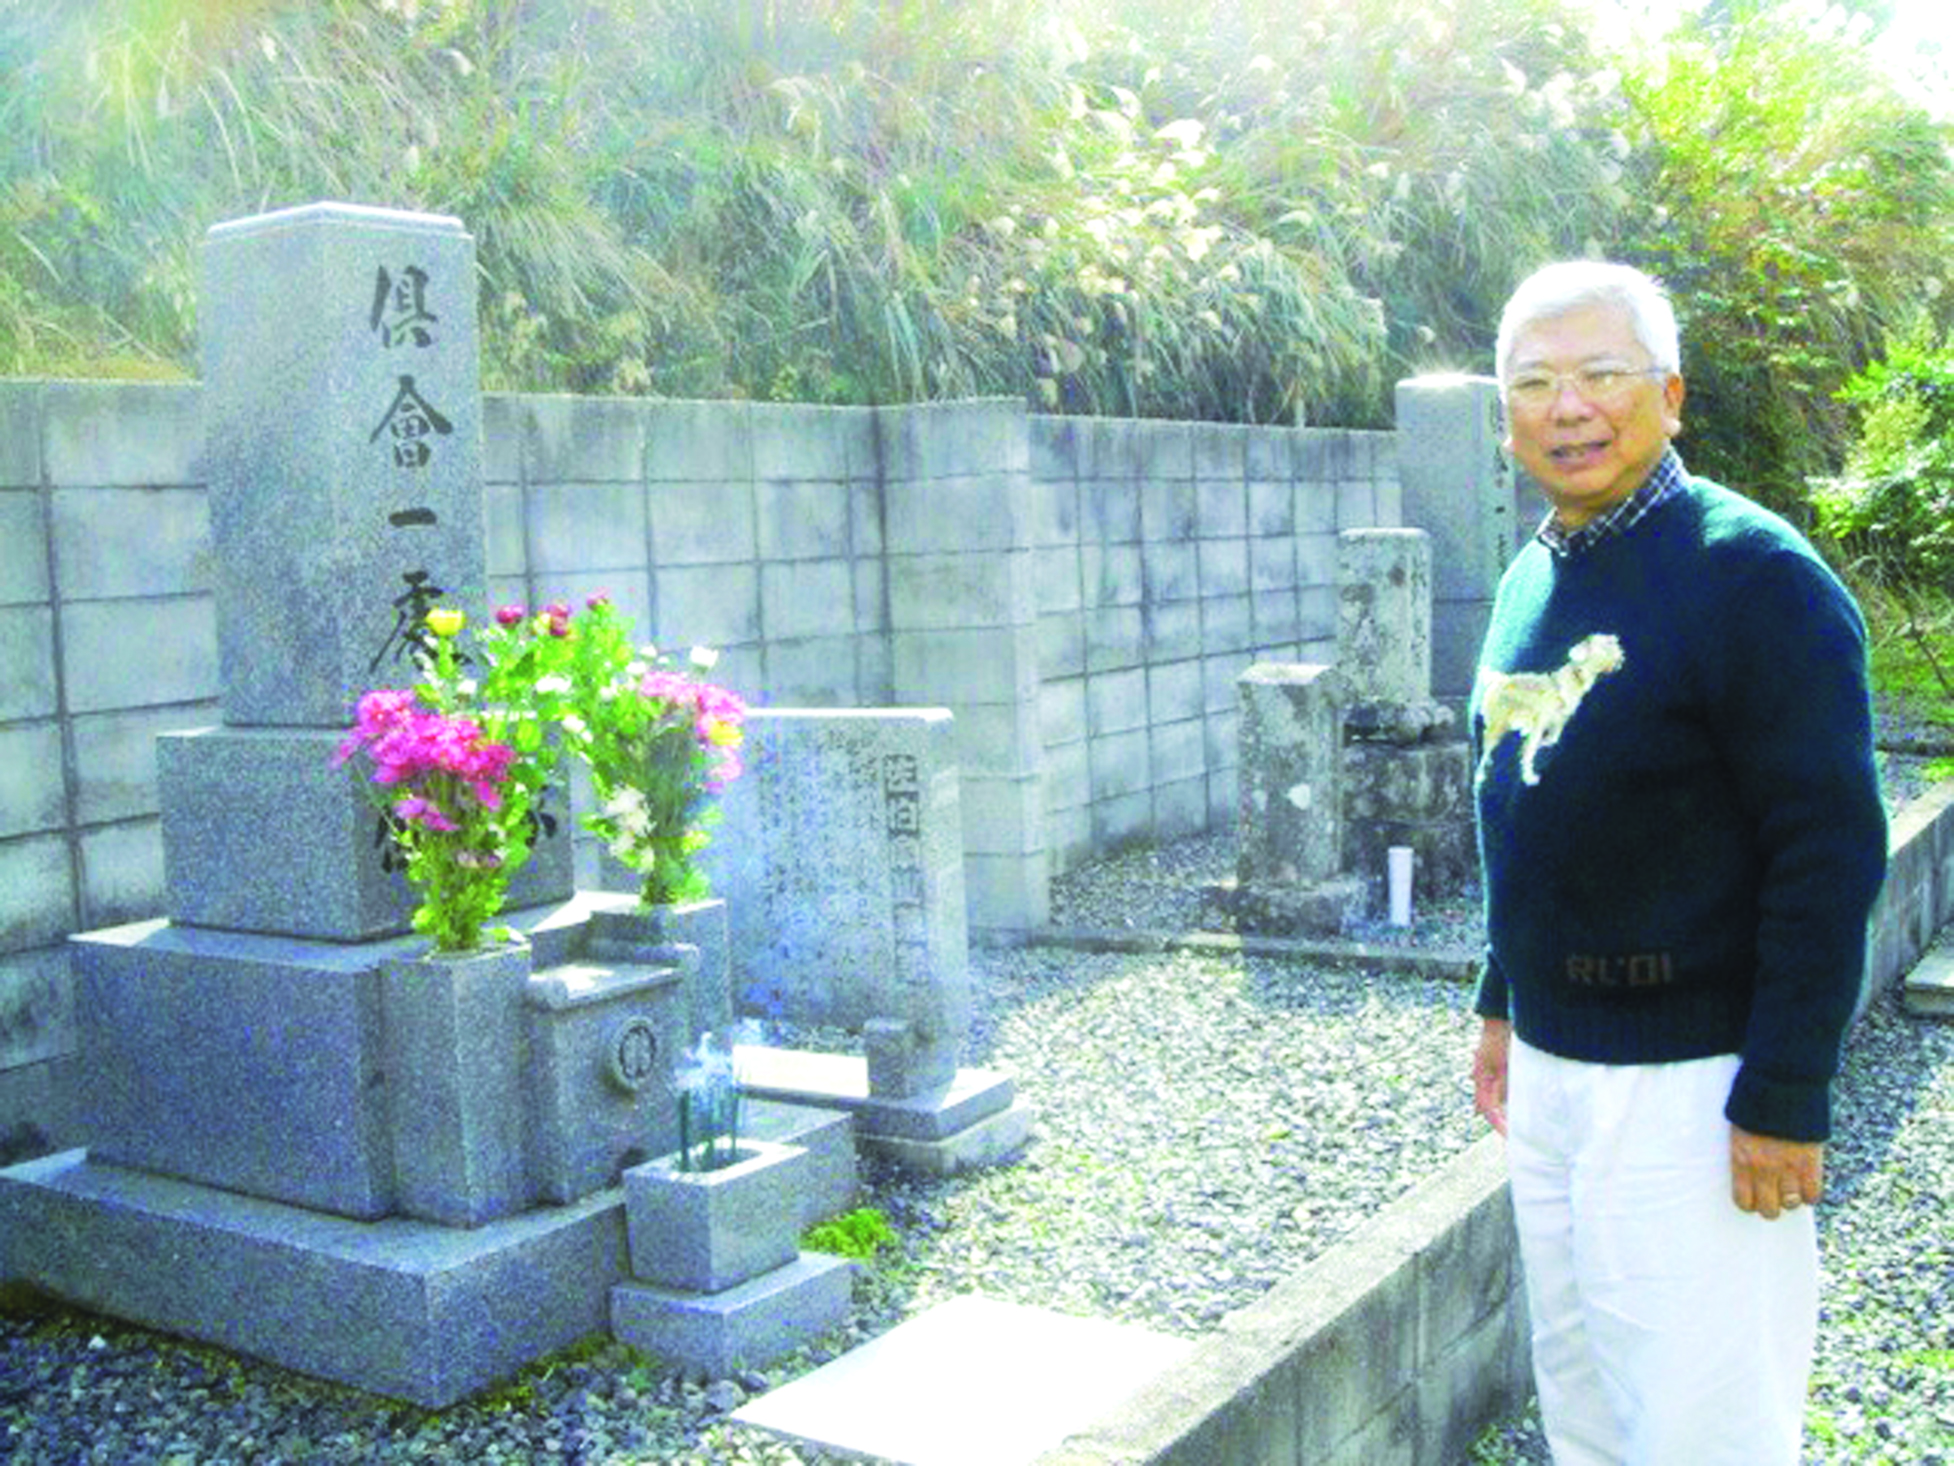 Cover Photo for Feb. 3rd's Issue - of Ken Saiki (Saeki) visiting his dad's Furusato